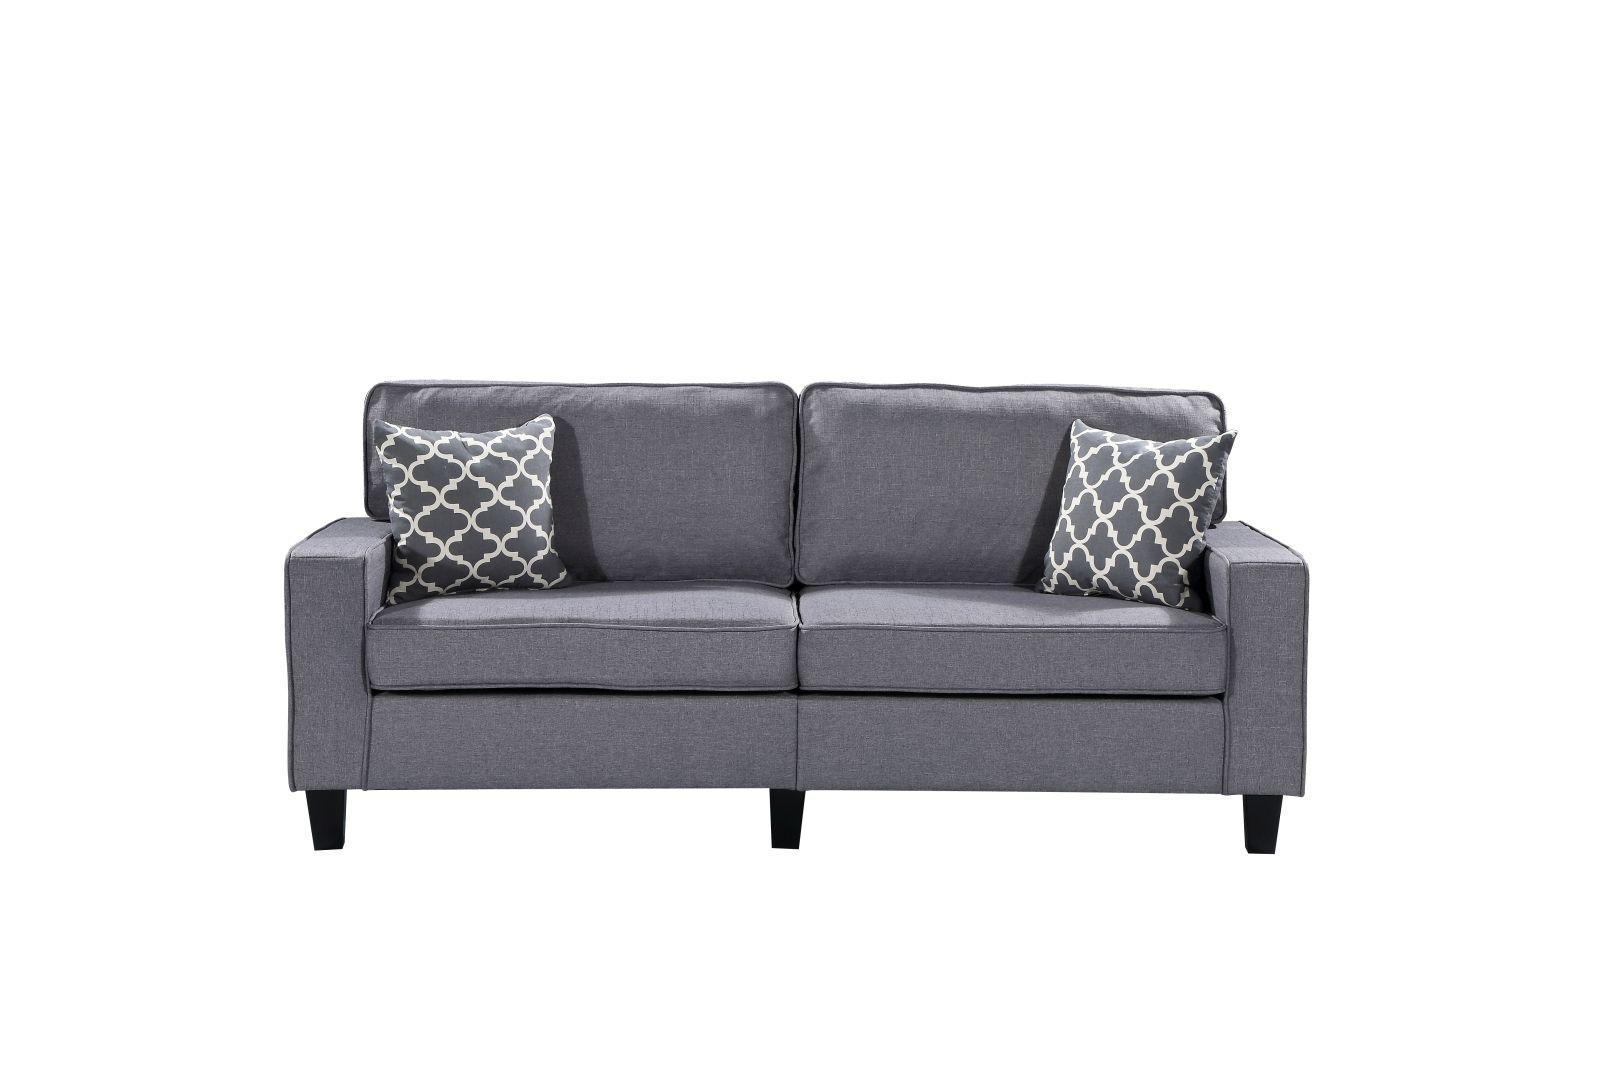 HS280 Husky Furniture Zara Sofa Gray W